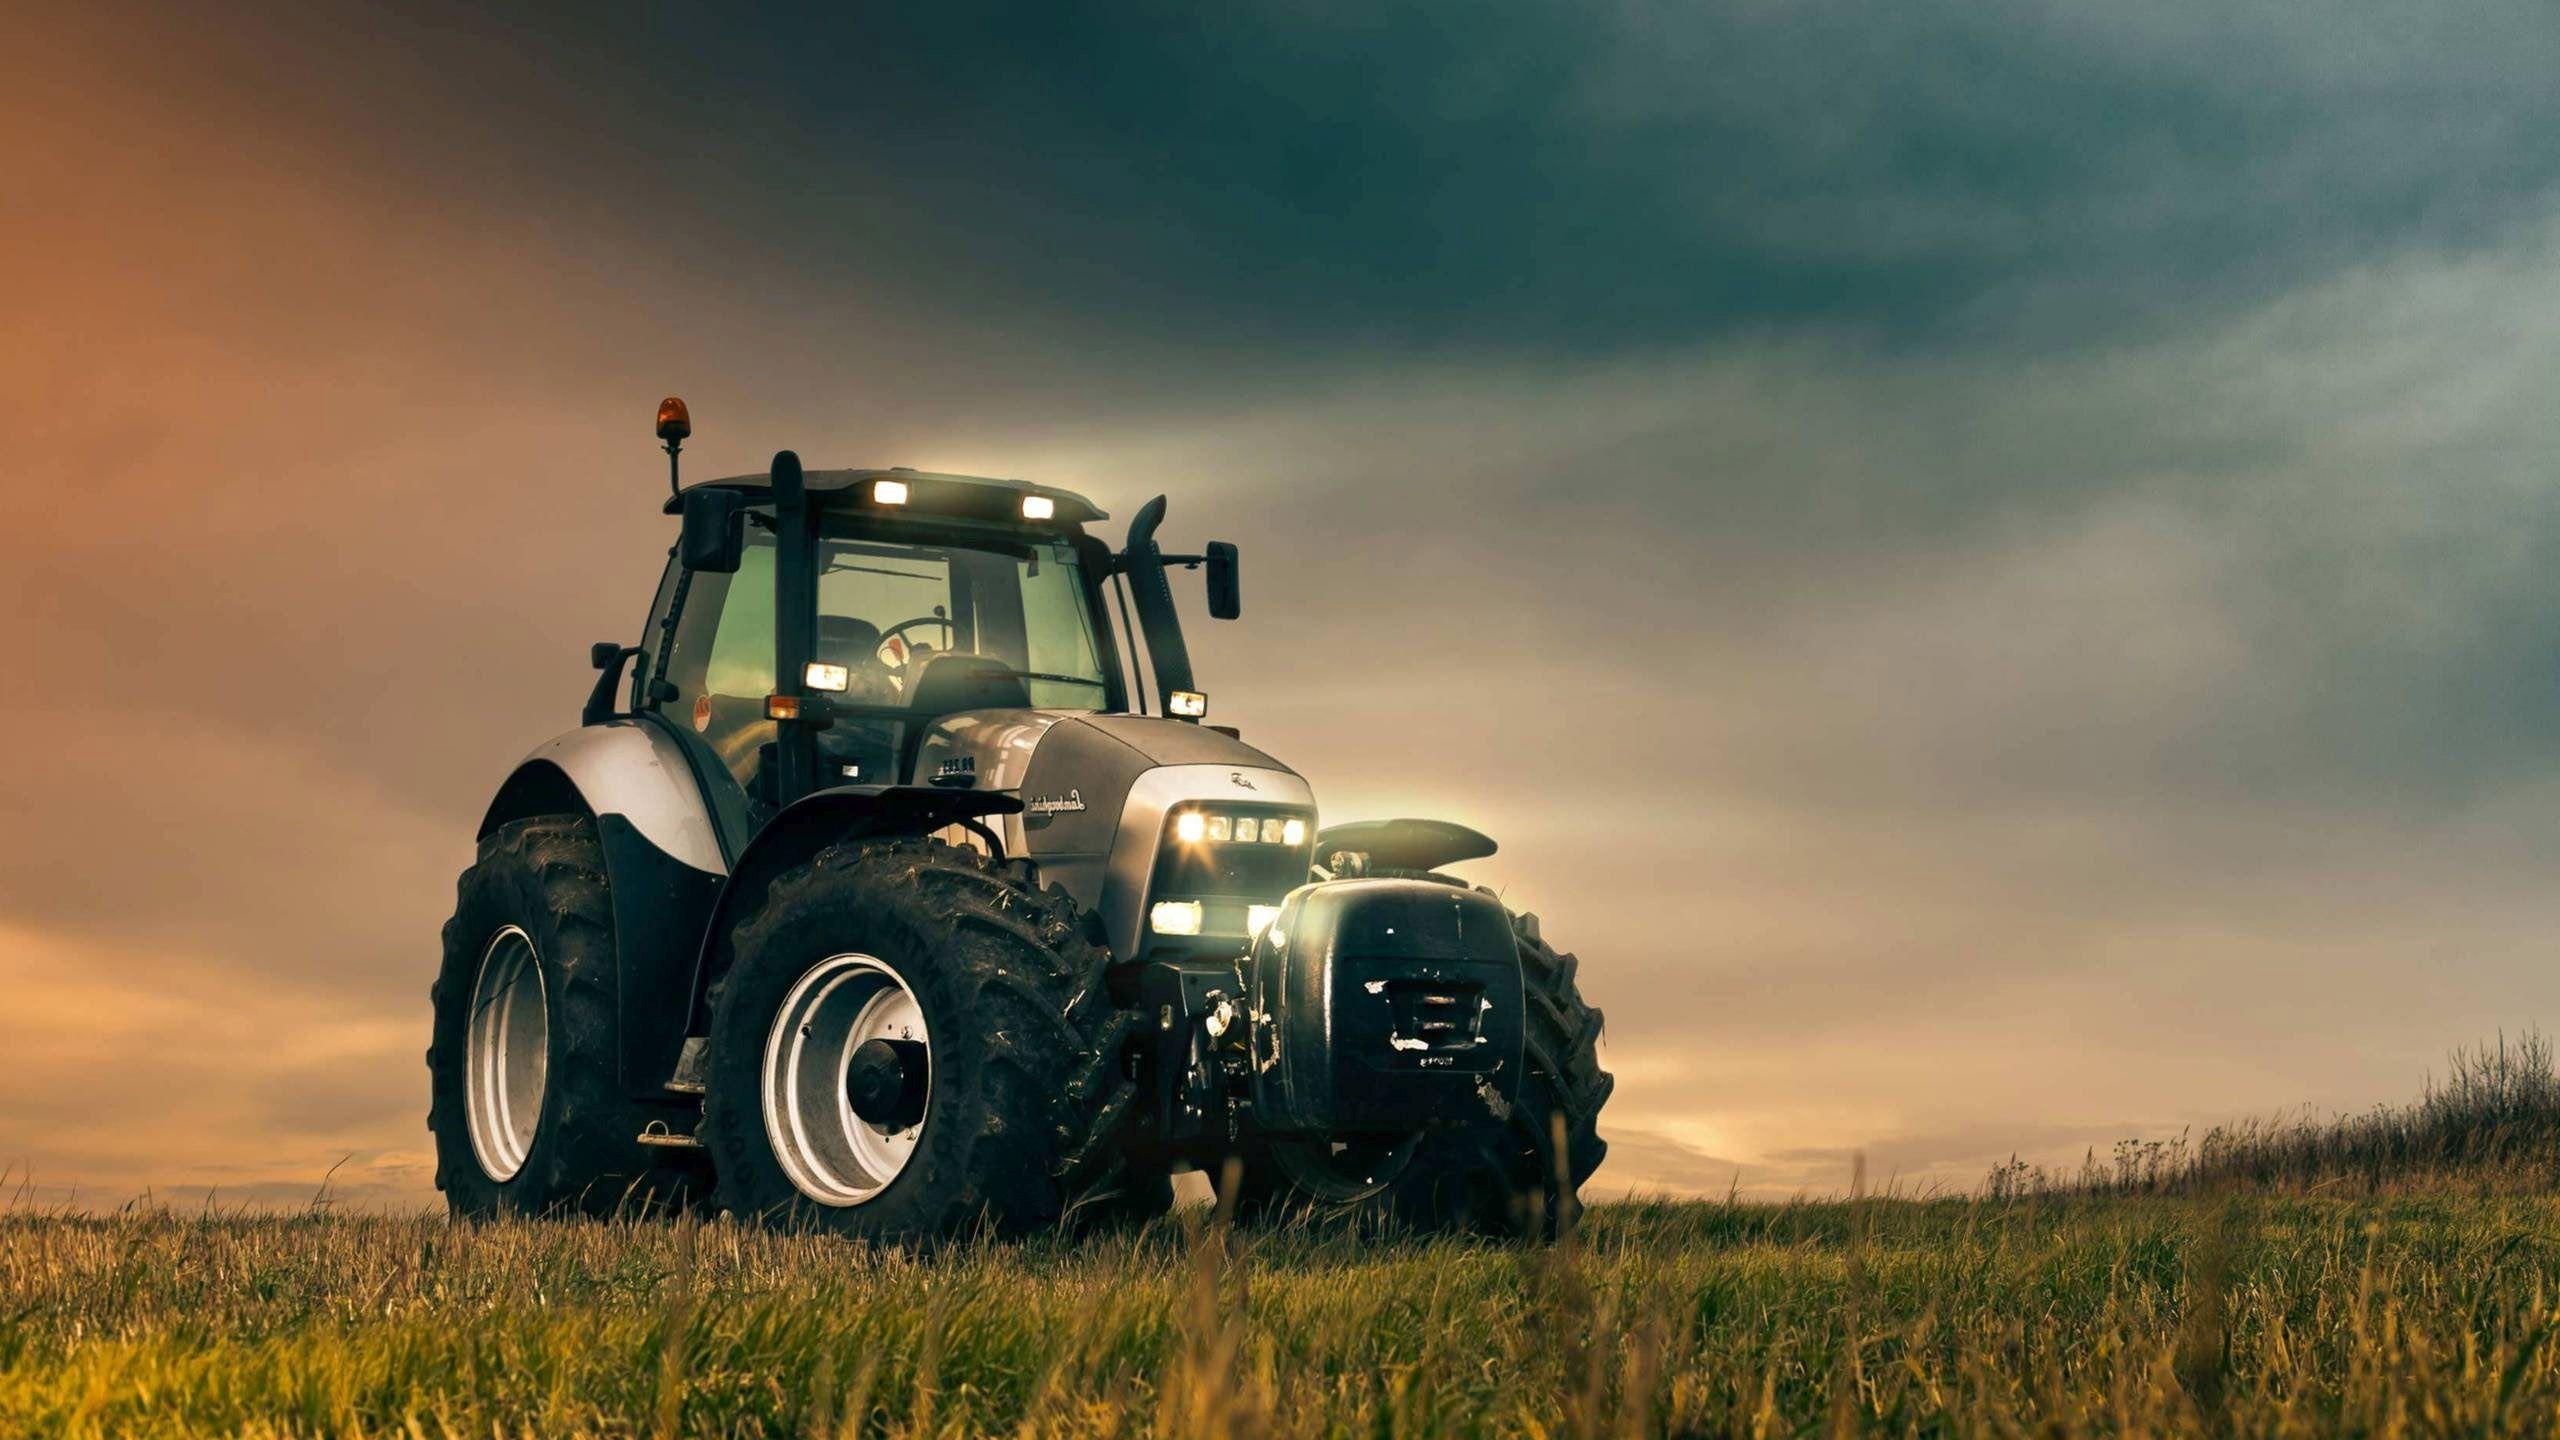 Best Tractor Wallpapers In High Quality Julietta Monzon 2560x1440